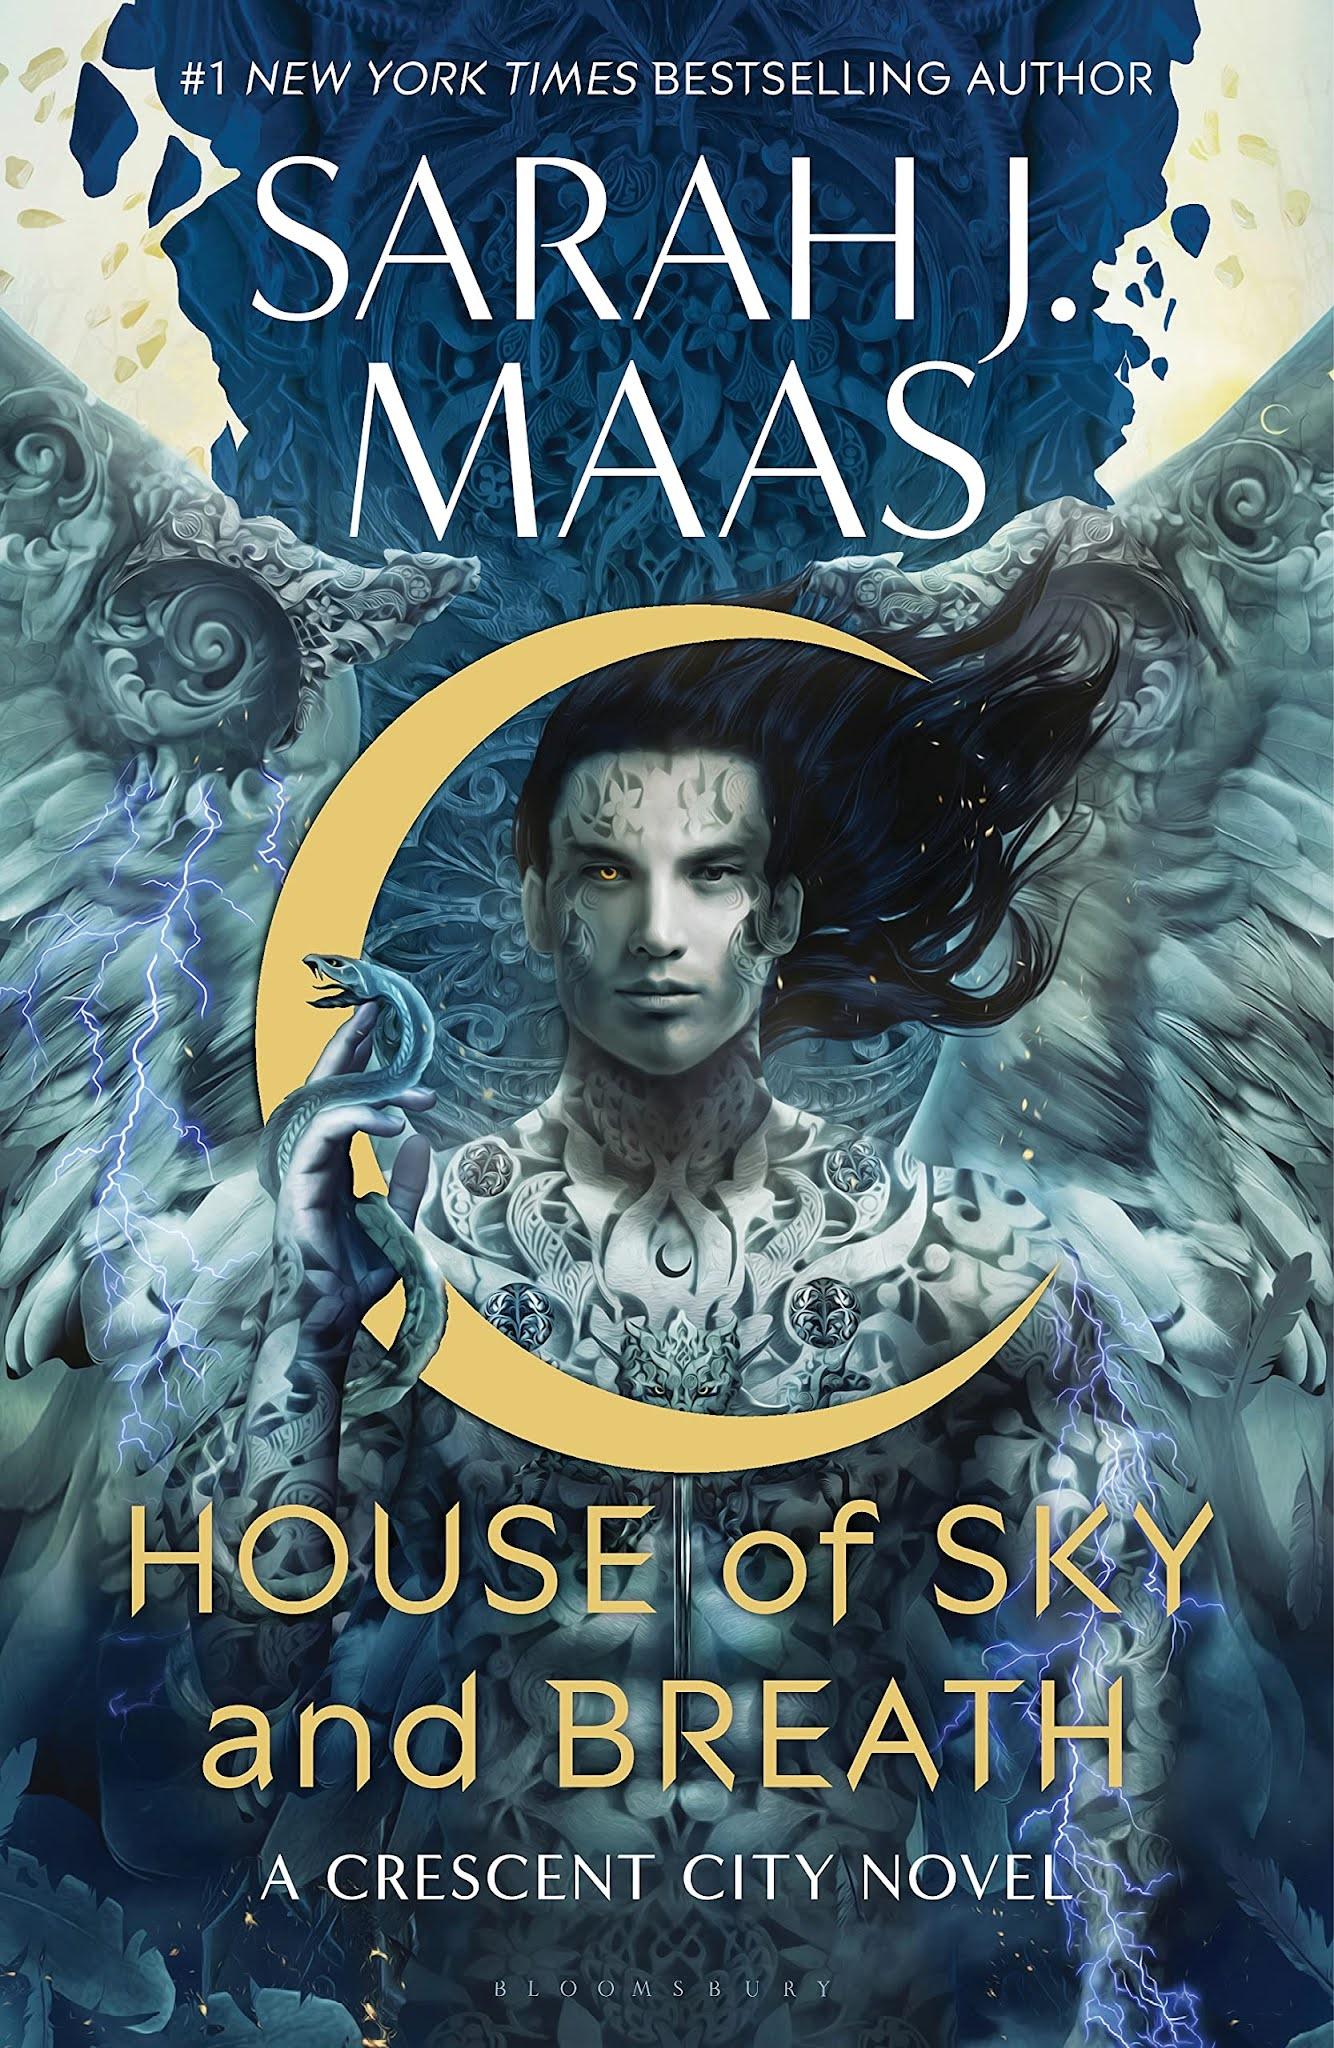 House of Sky and Breath by Sarah J. Maas